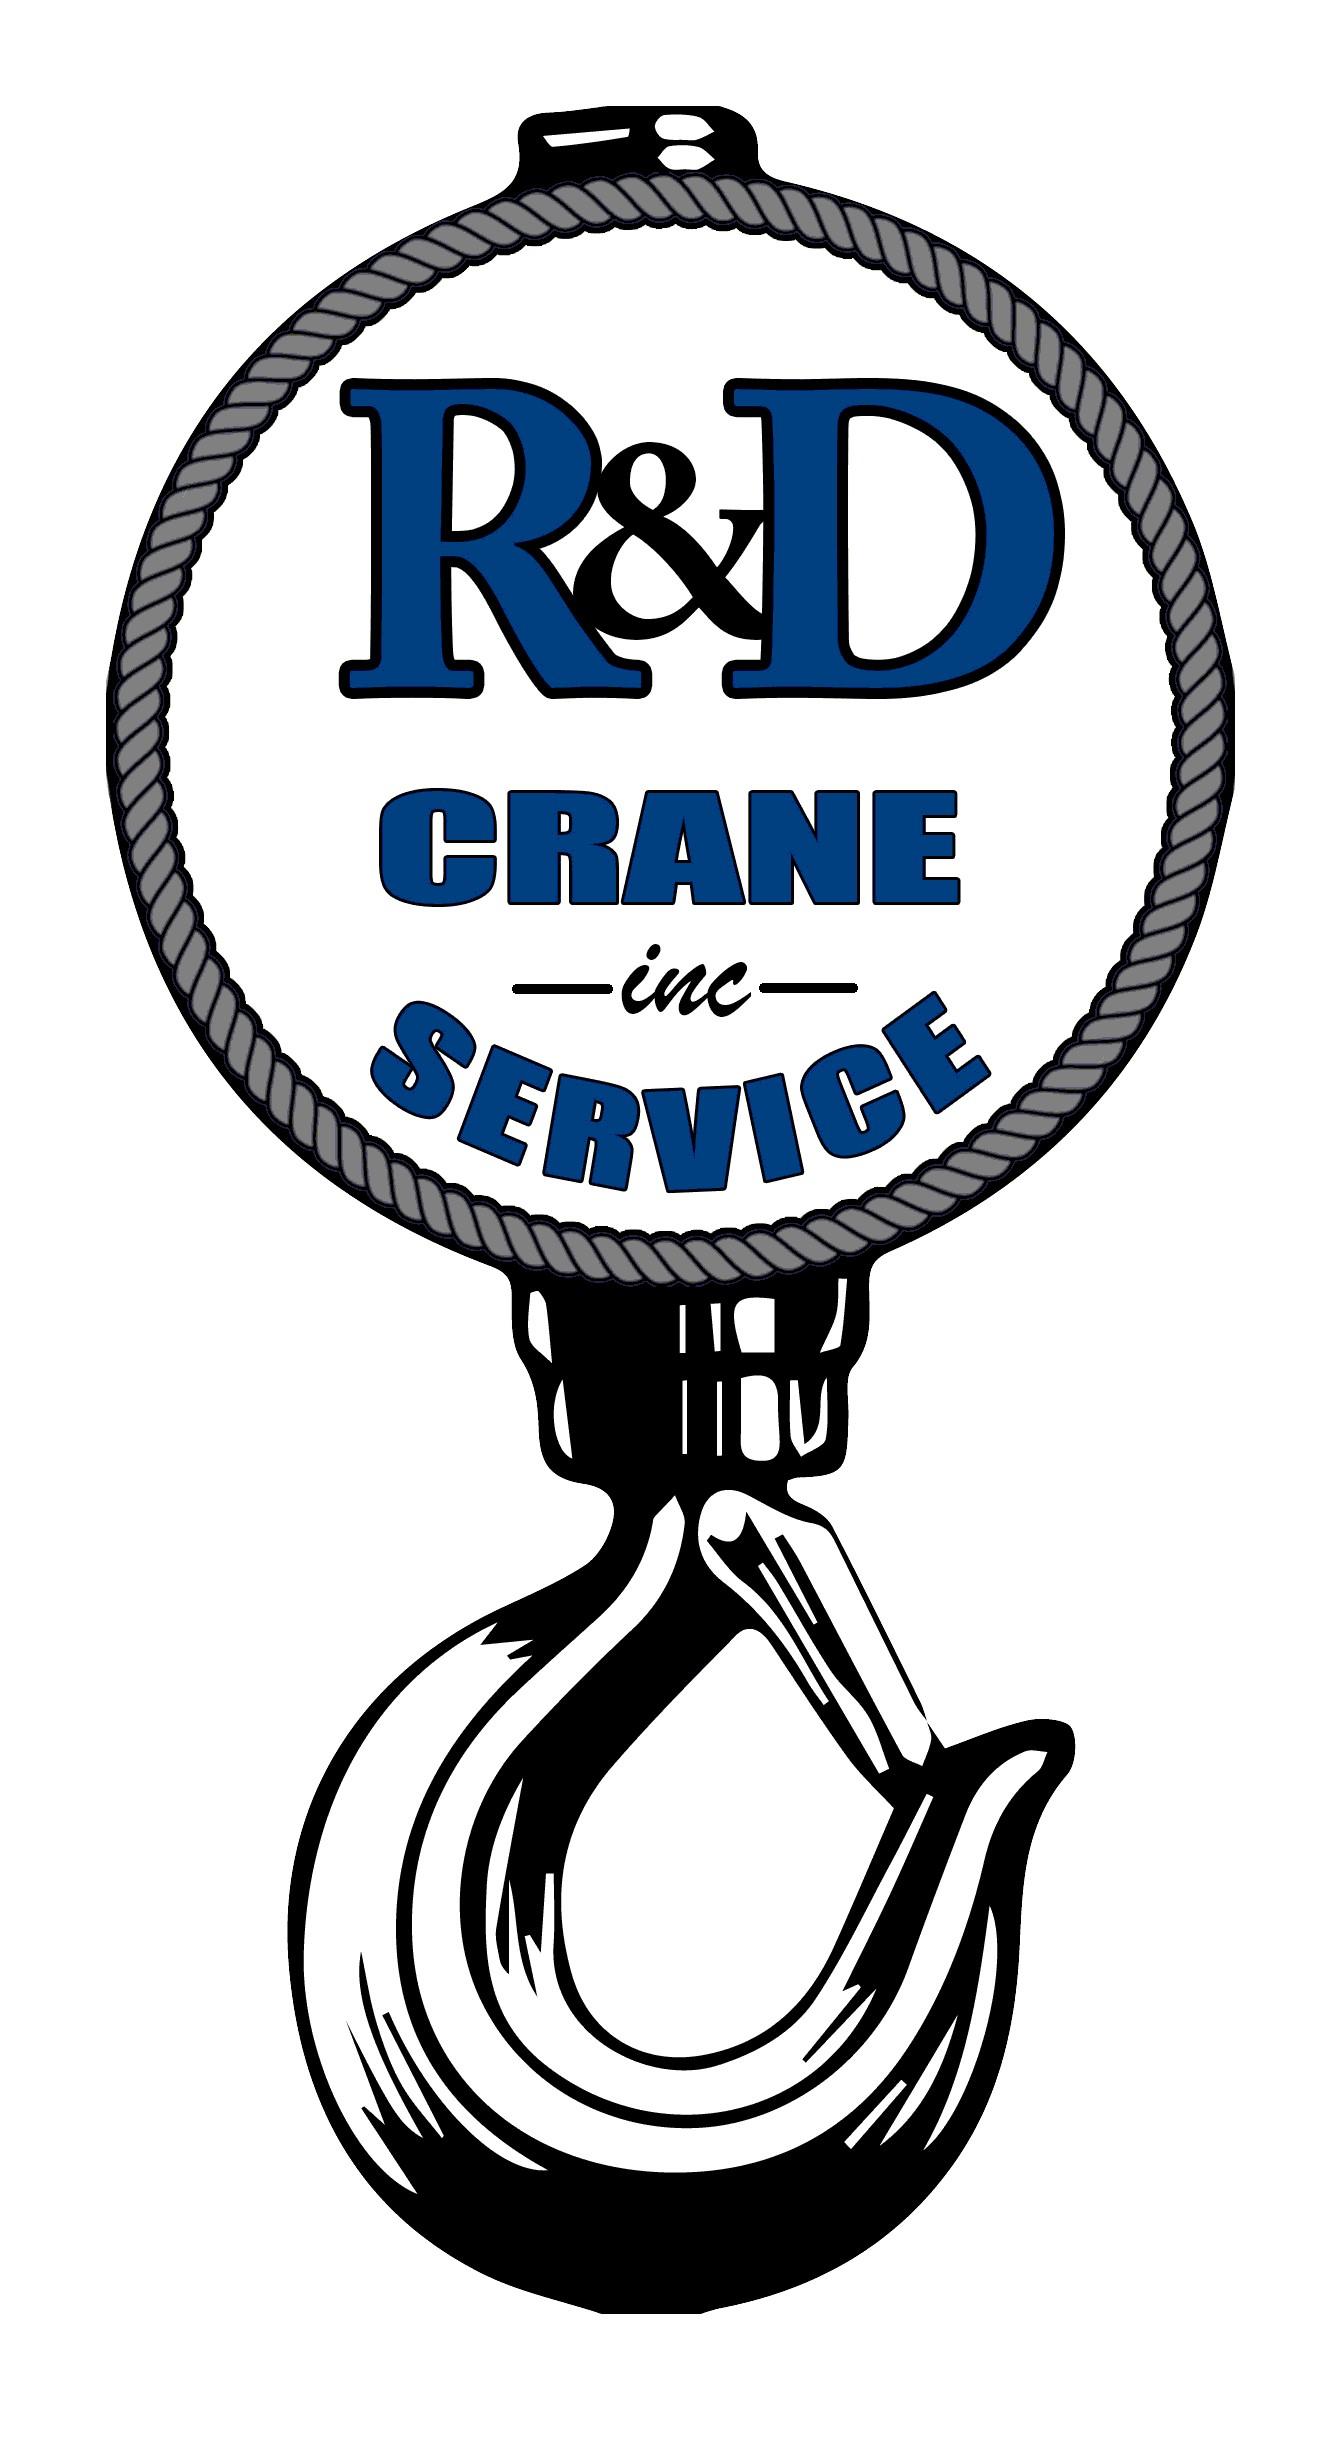 R&D Crane Service, Inc.